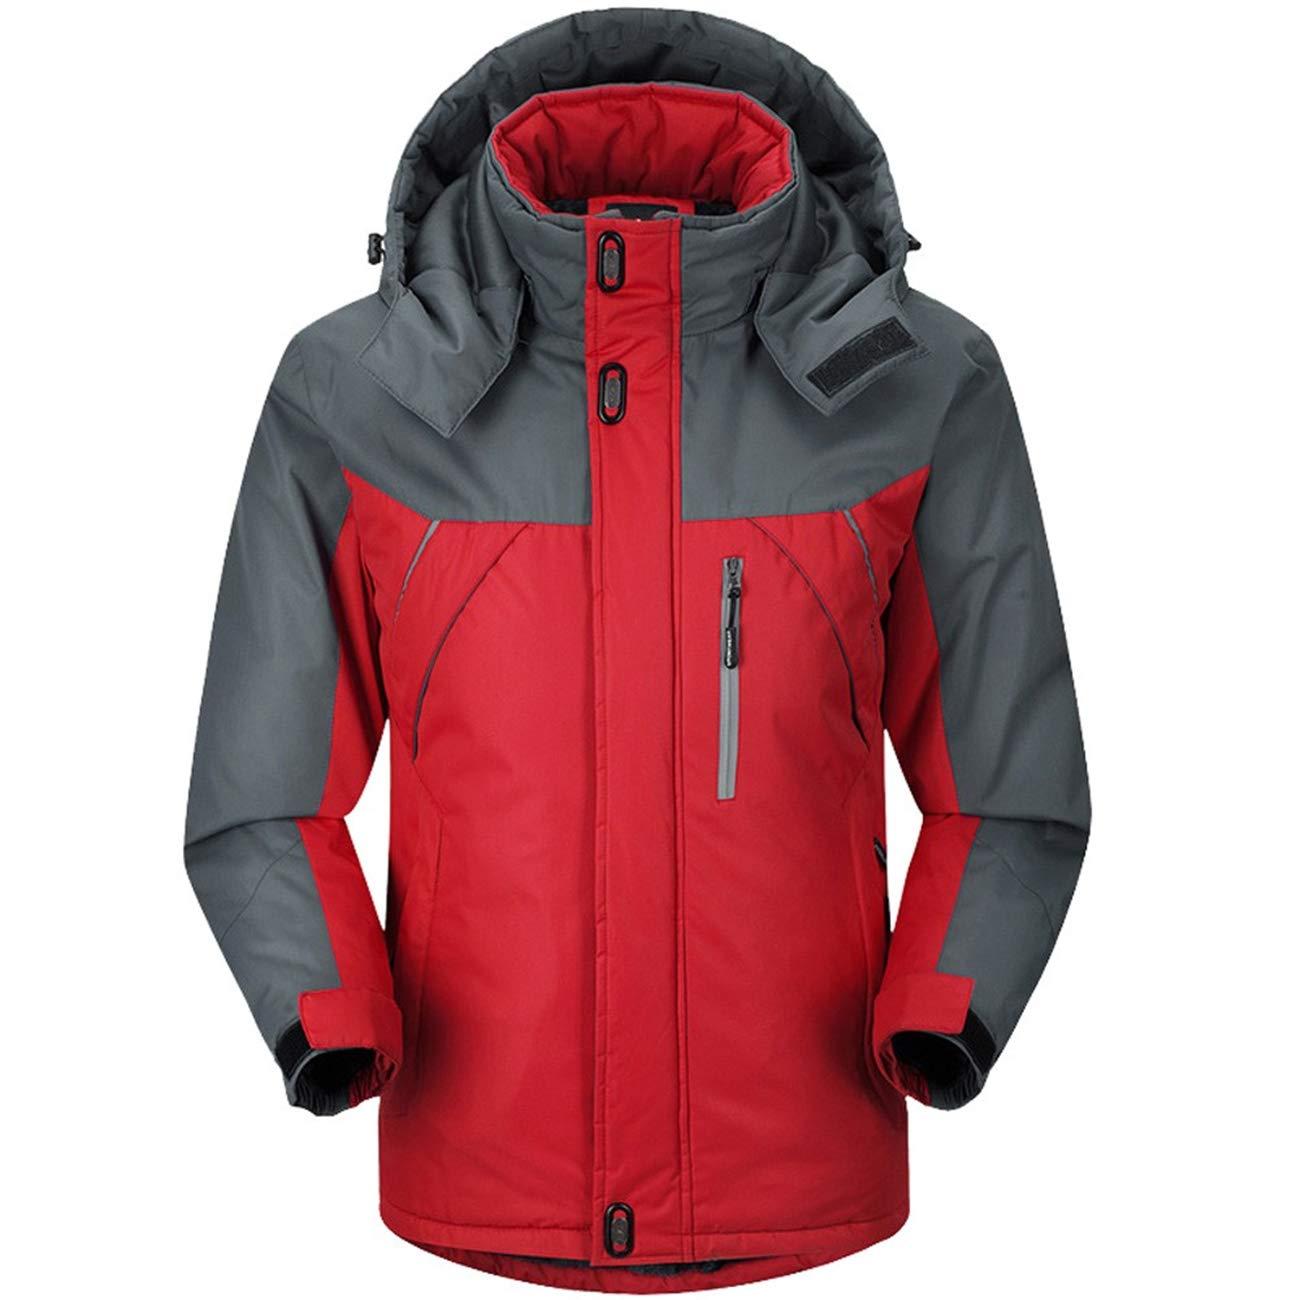 Rosennie Fashion Mens Wind Jacket,Men Autumn Winter Casual Hooded Warm Long Sleeve Padded Velvet Thickened Outwear Sport Loose Pocket Slim Leisure Tops Zip Thick Fleece Coat